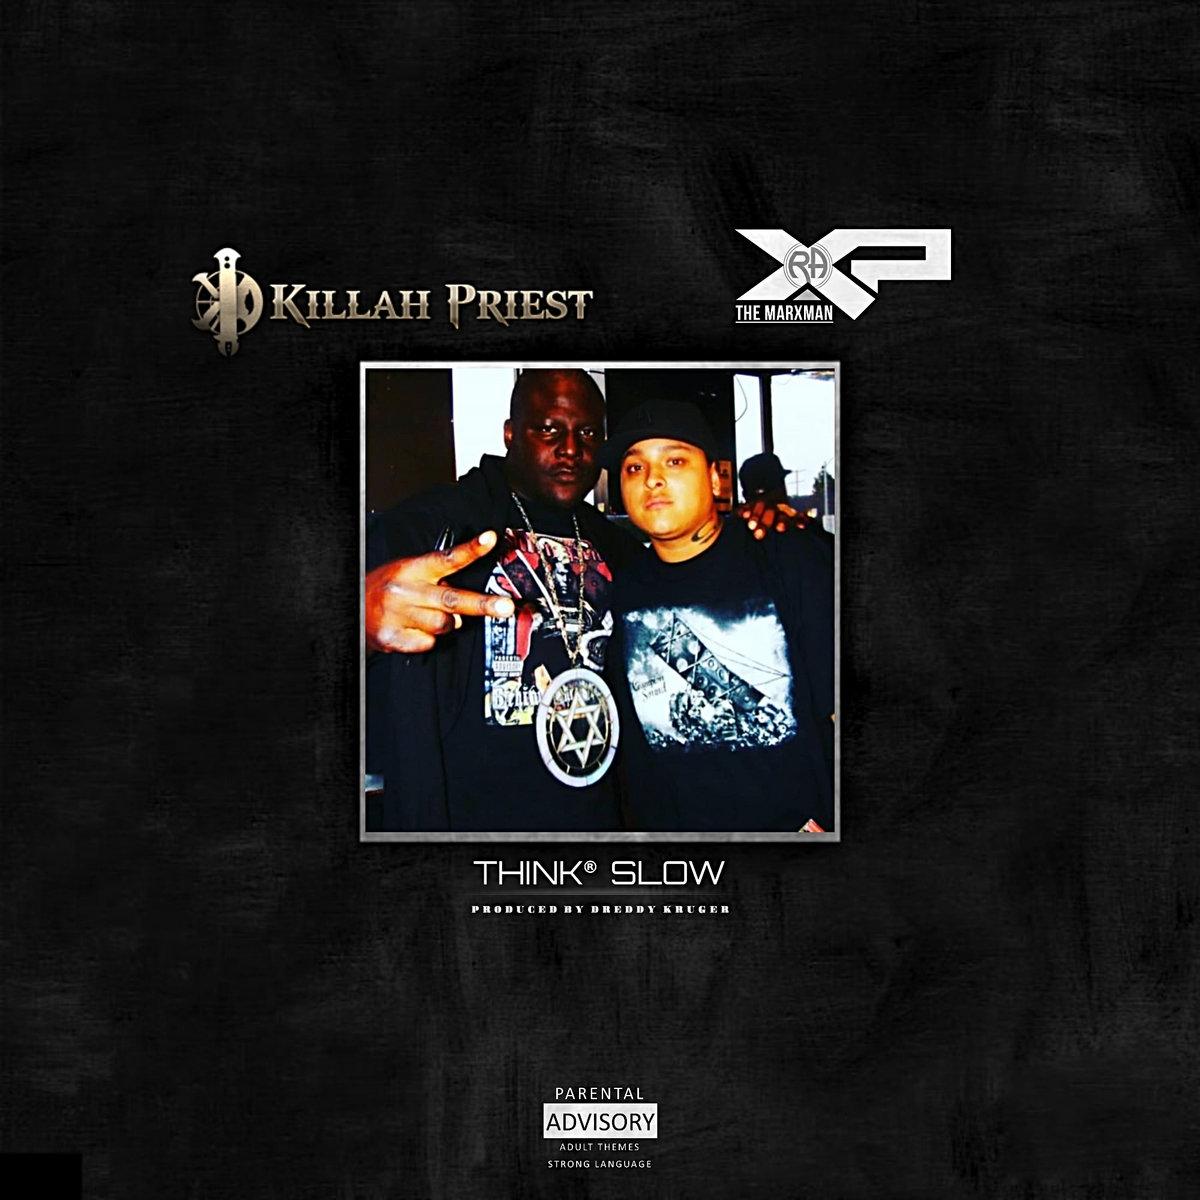 Think Slow Guest Starring Killah Priest Xp The Marxman Th